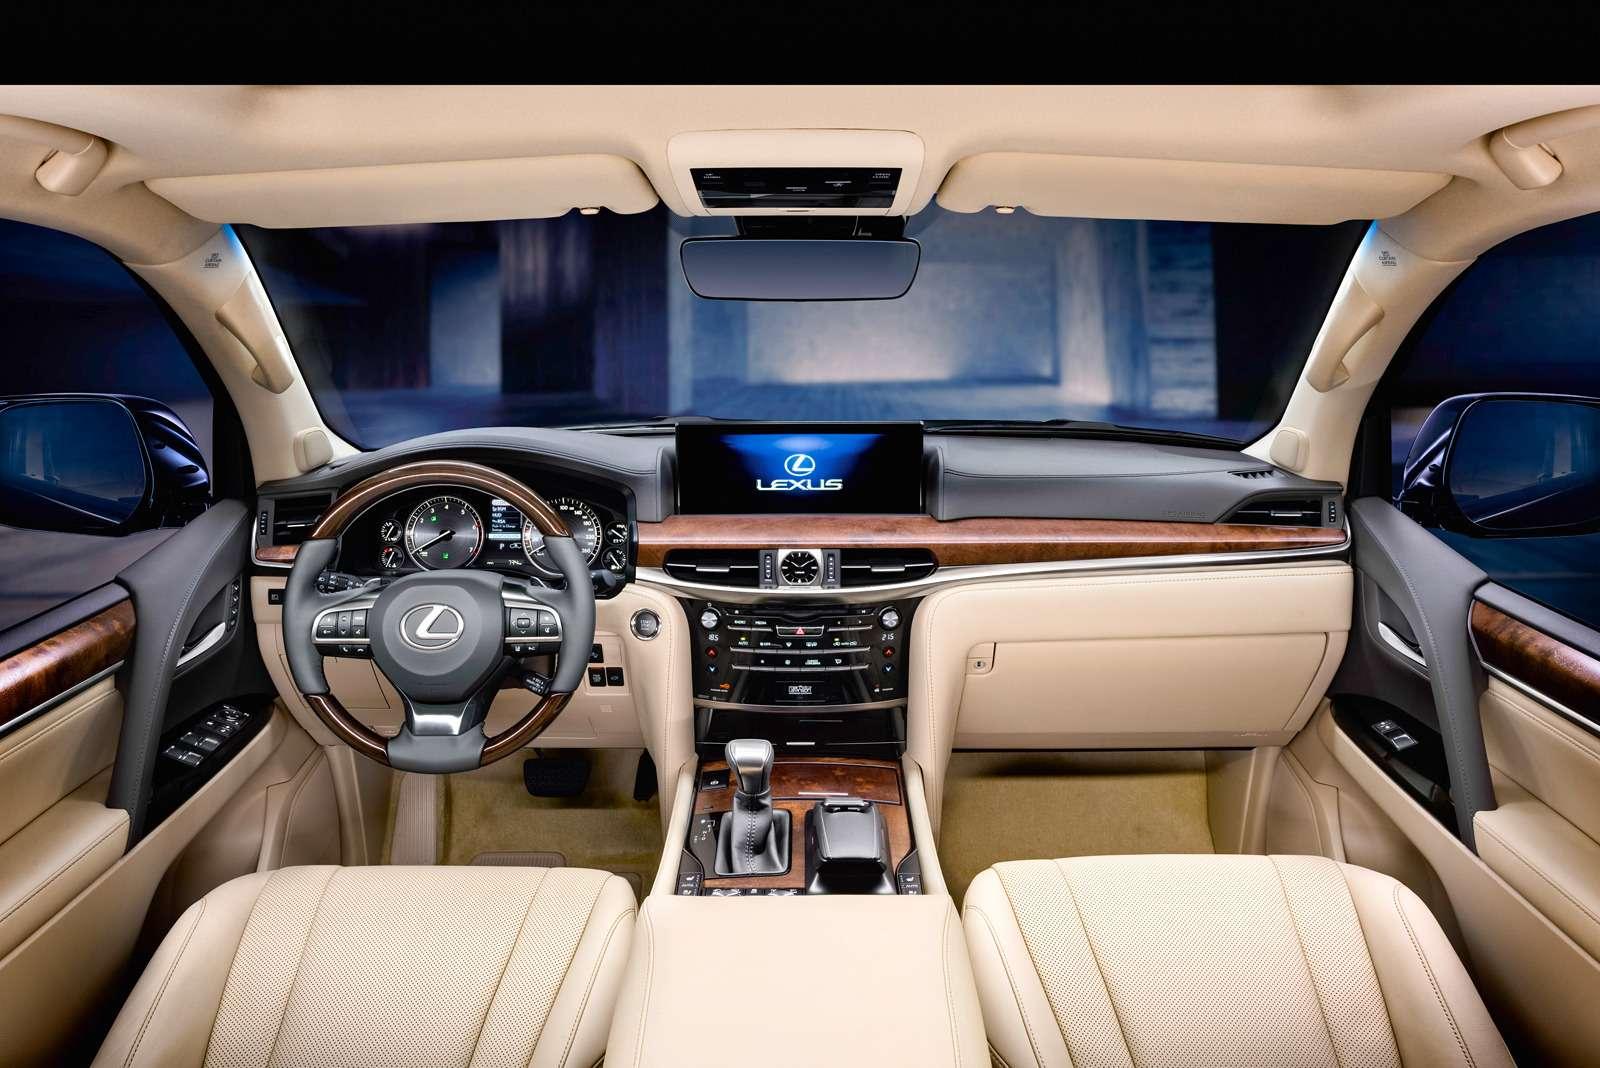 03-Lexus-LX_zr-01_16